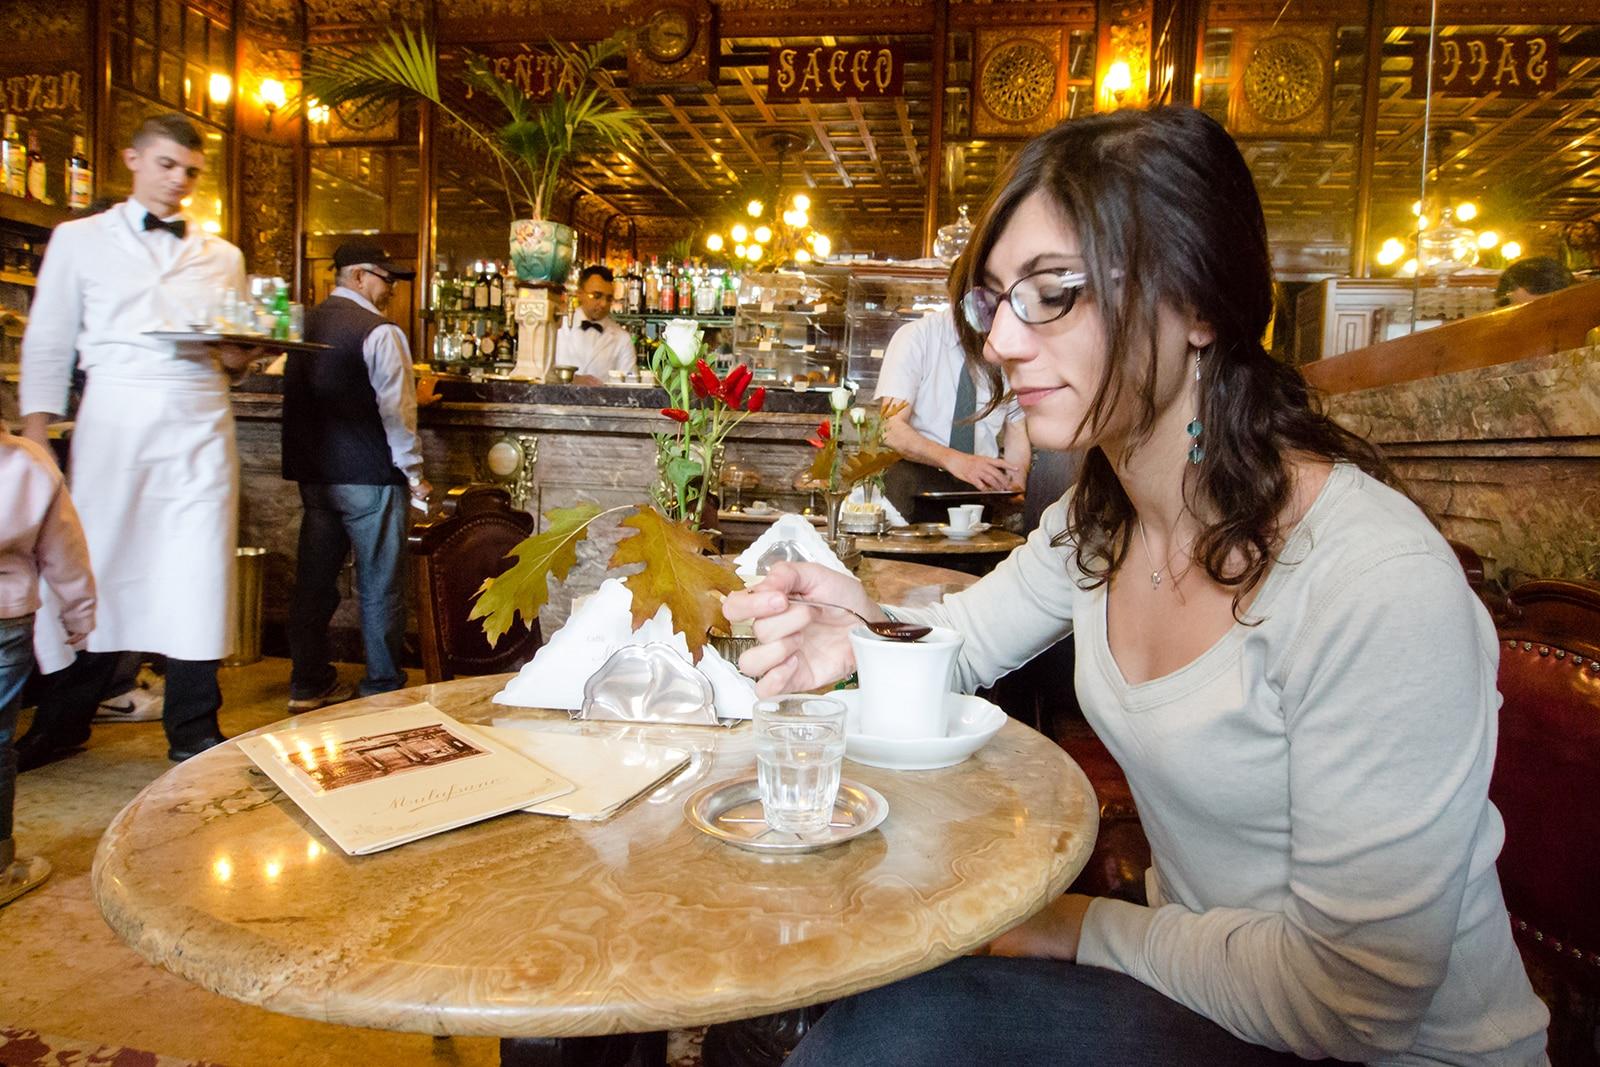 Torino, tramezzino, bar